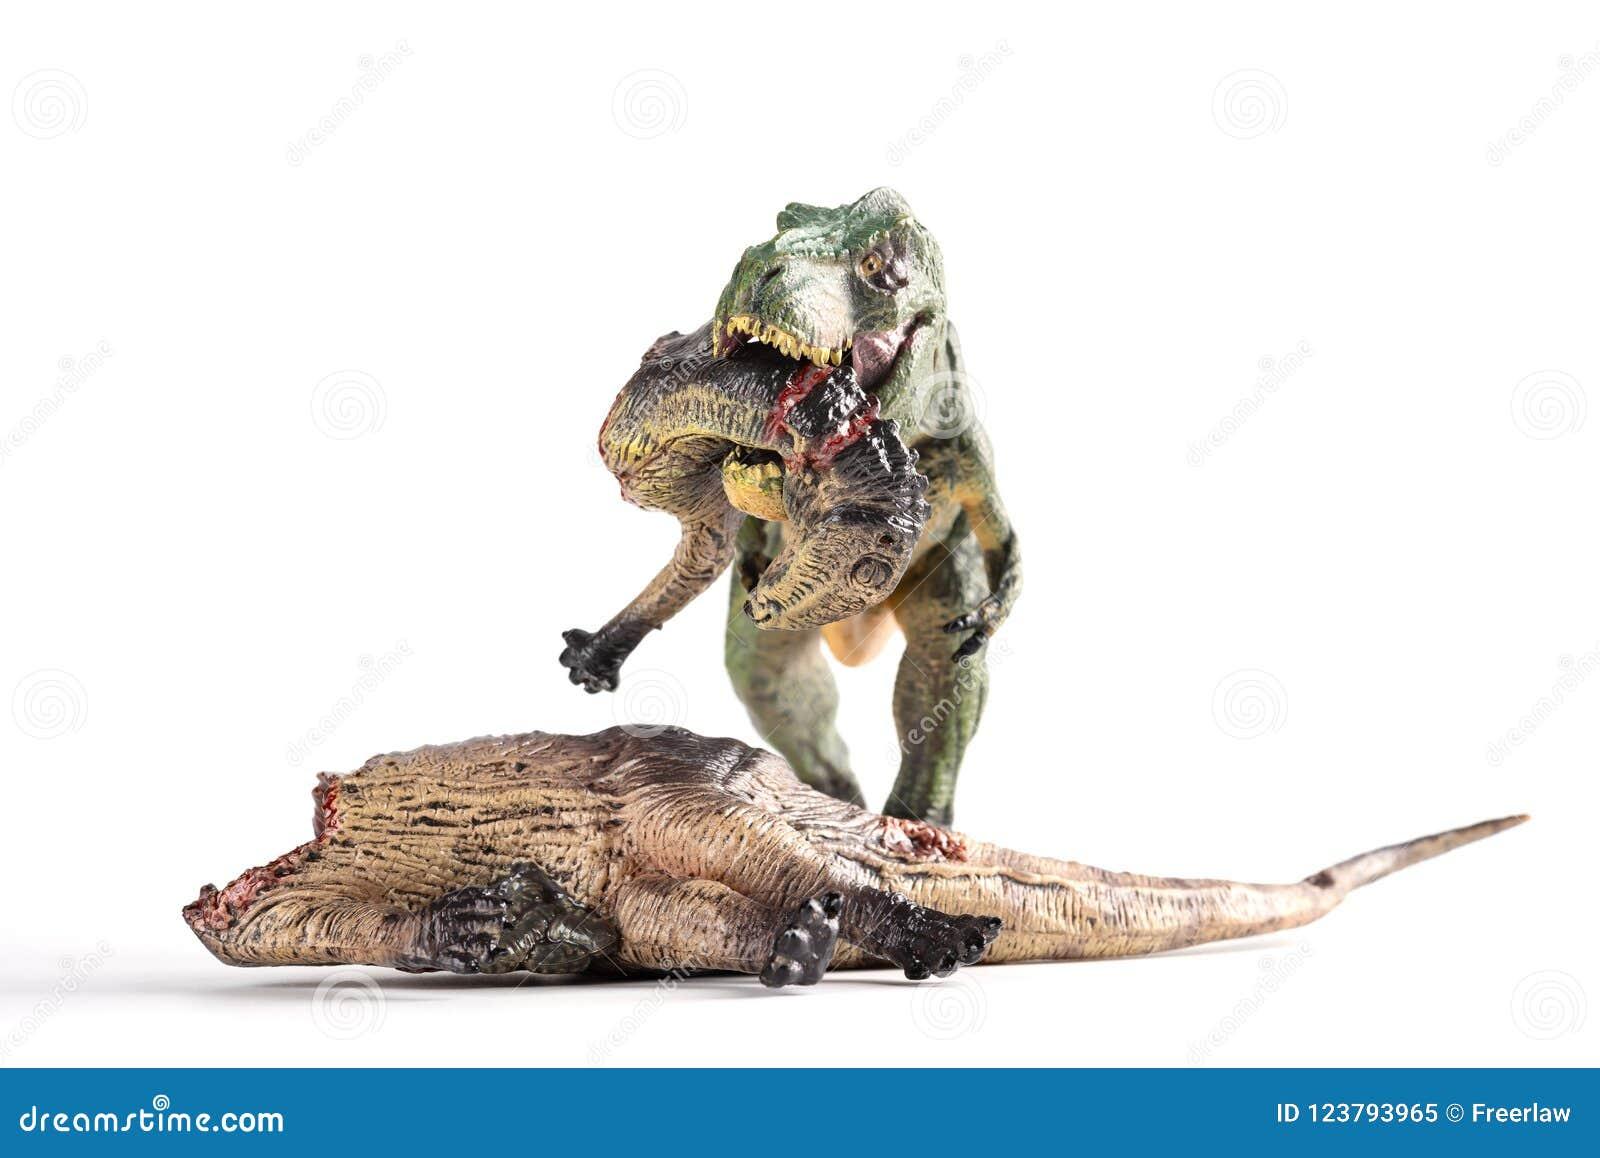 Front view tyrannosaurus biting a dinosaur body on white